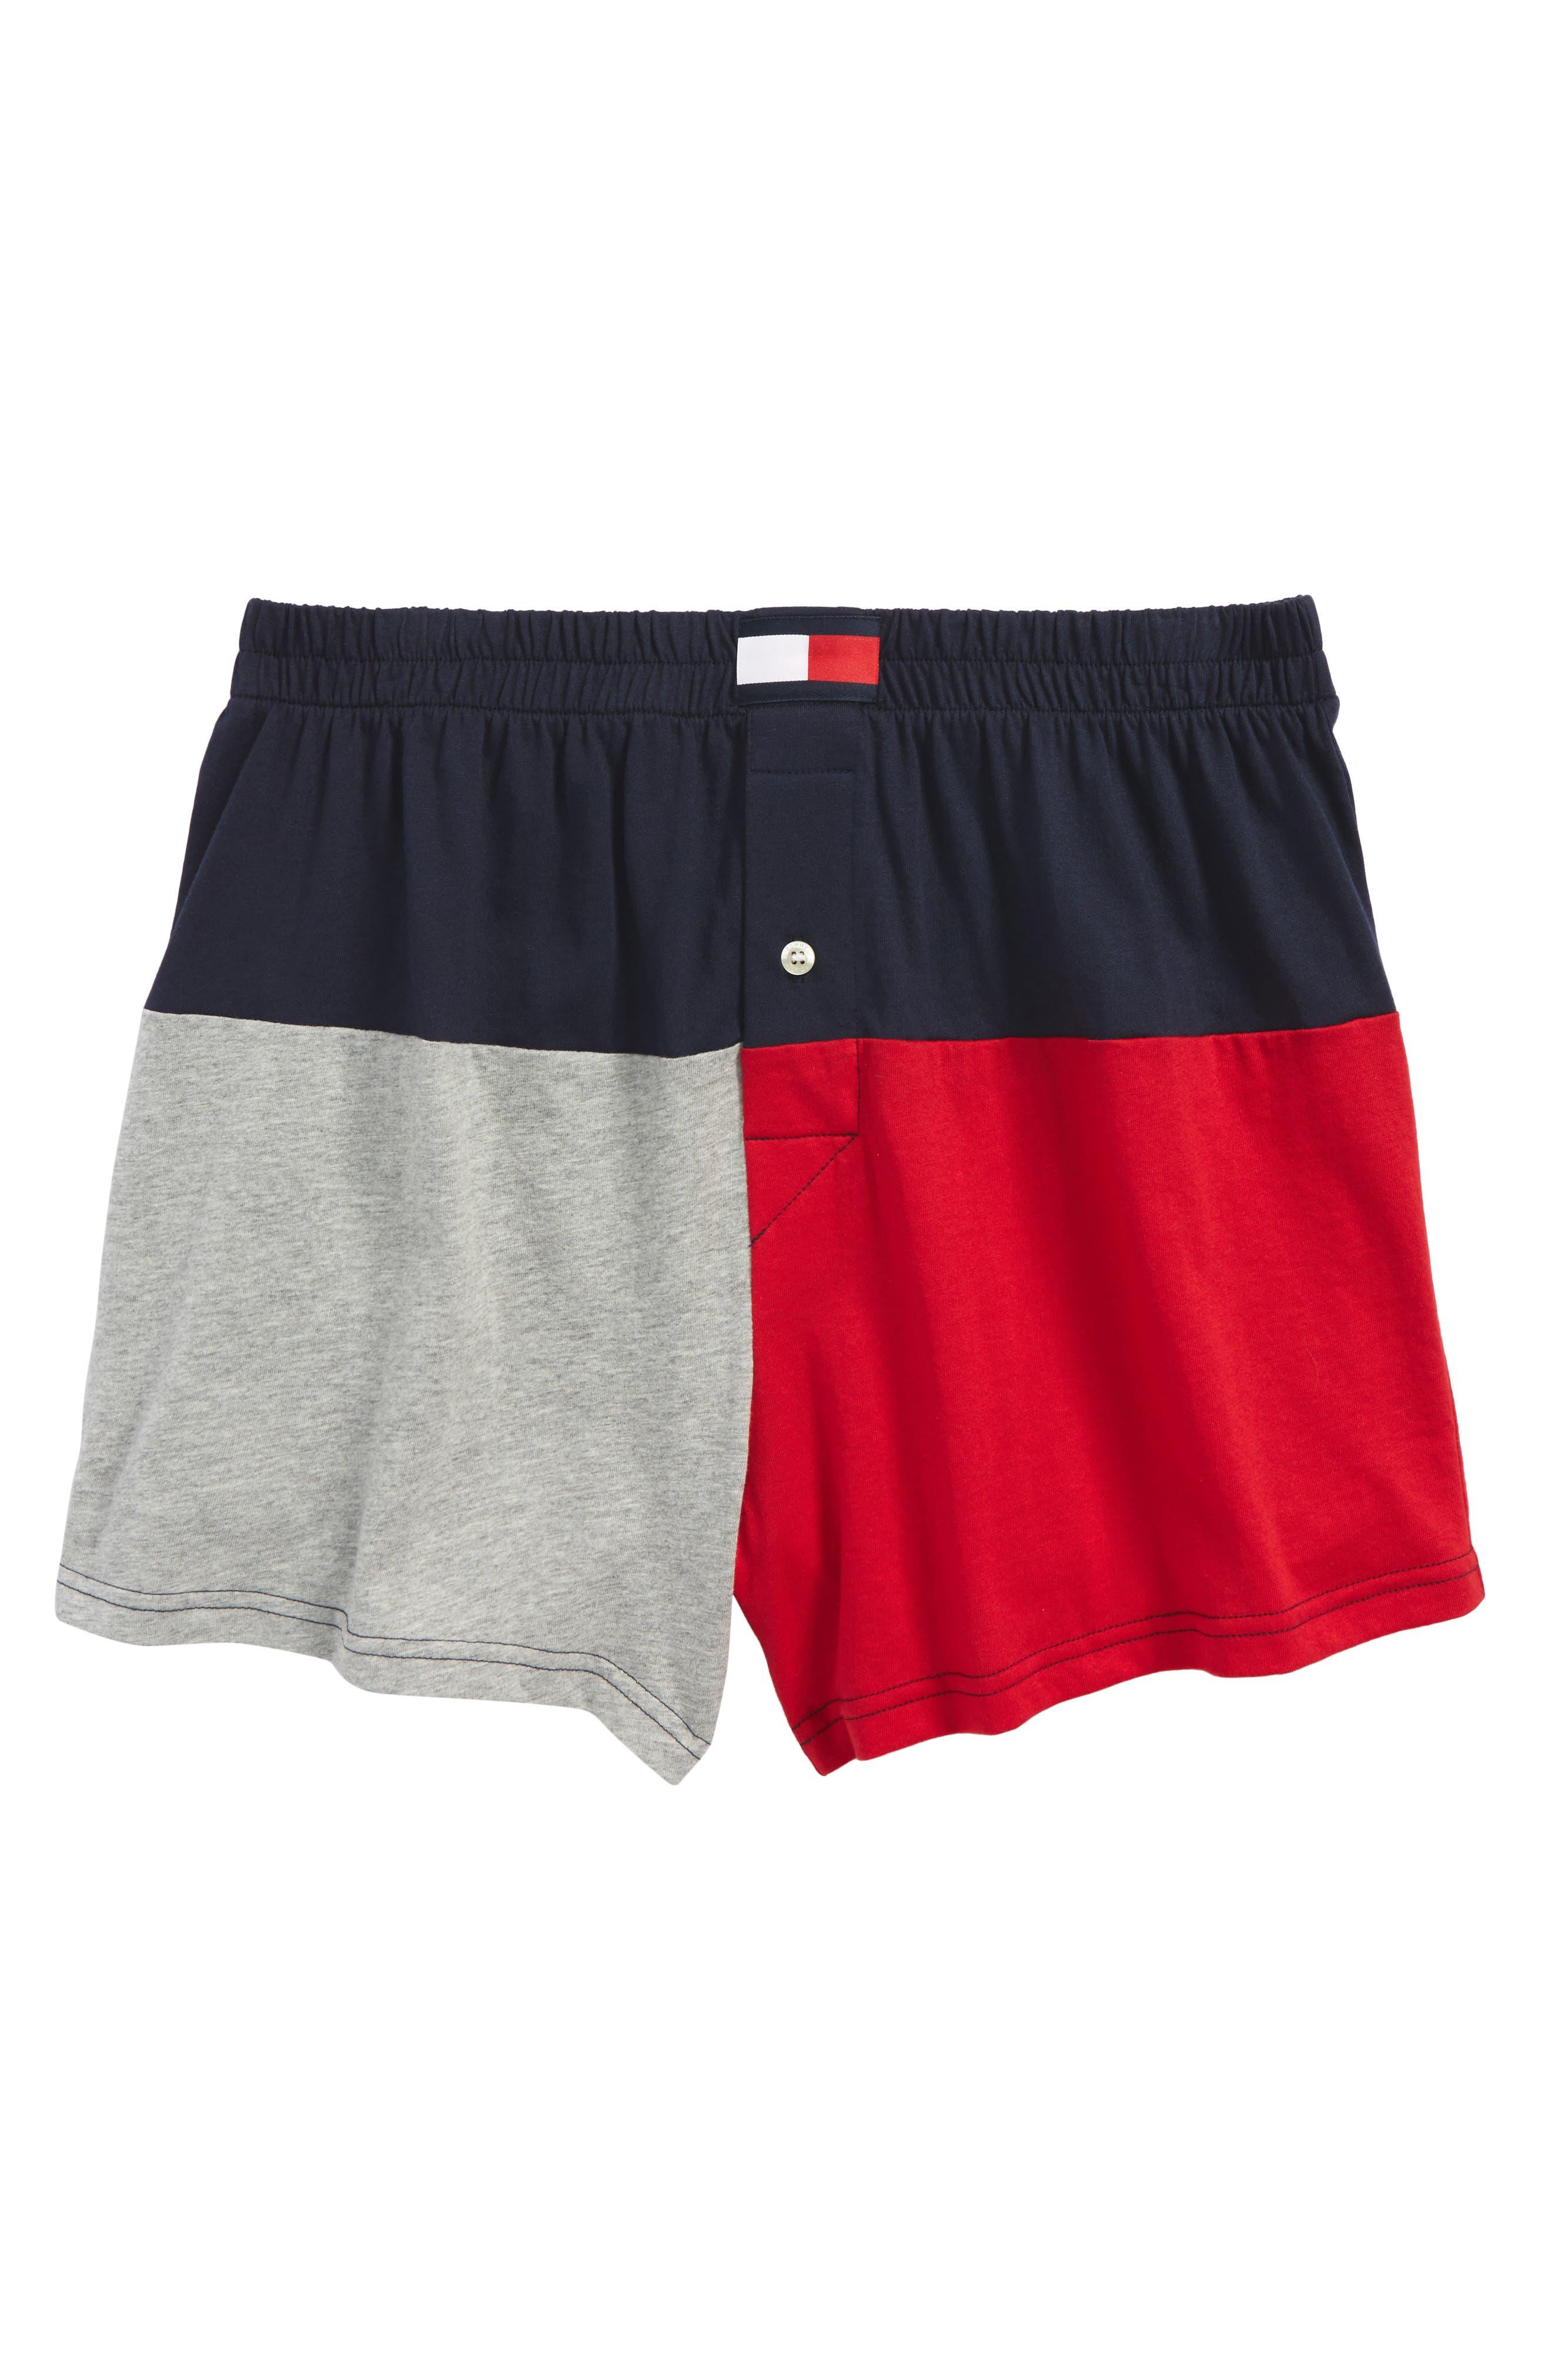 Colorblock Knit Boxers,                         Main,                         color, Dark Navy